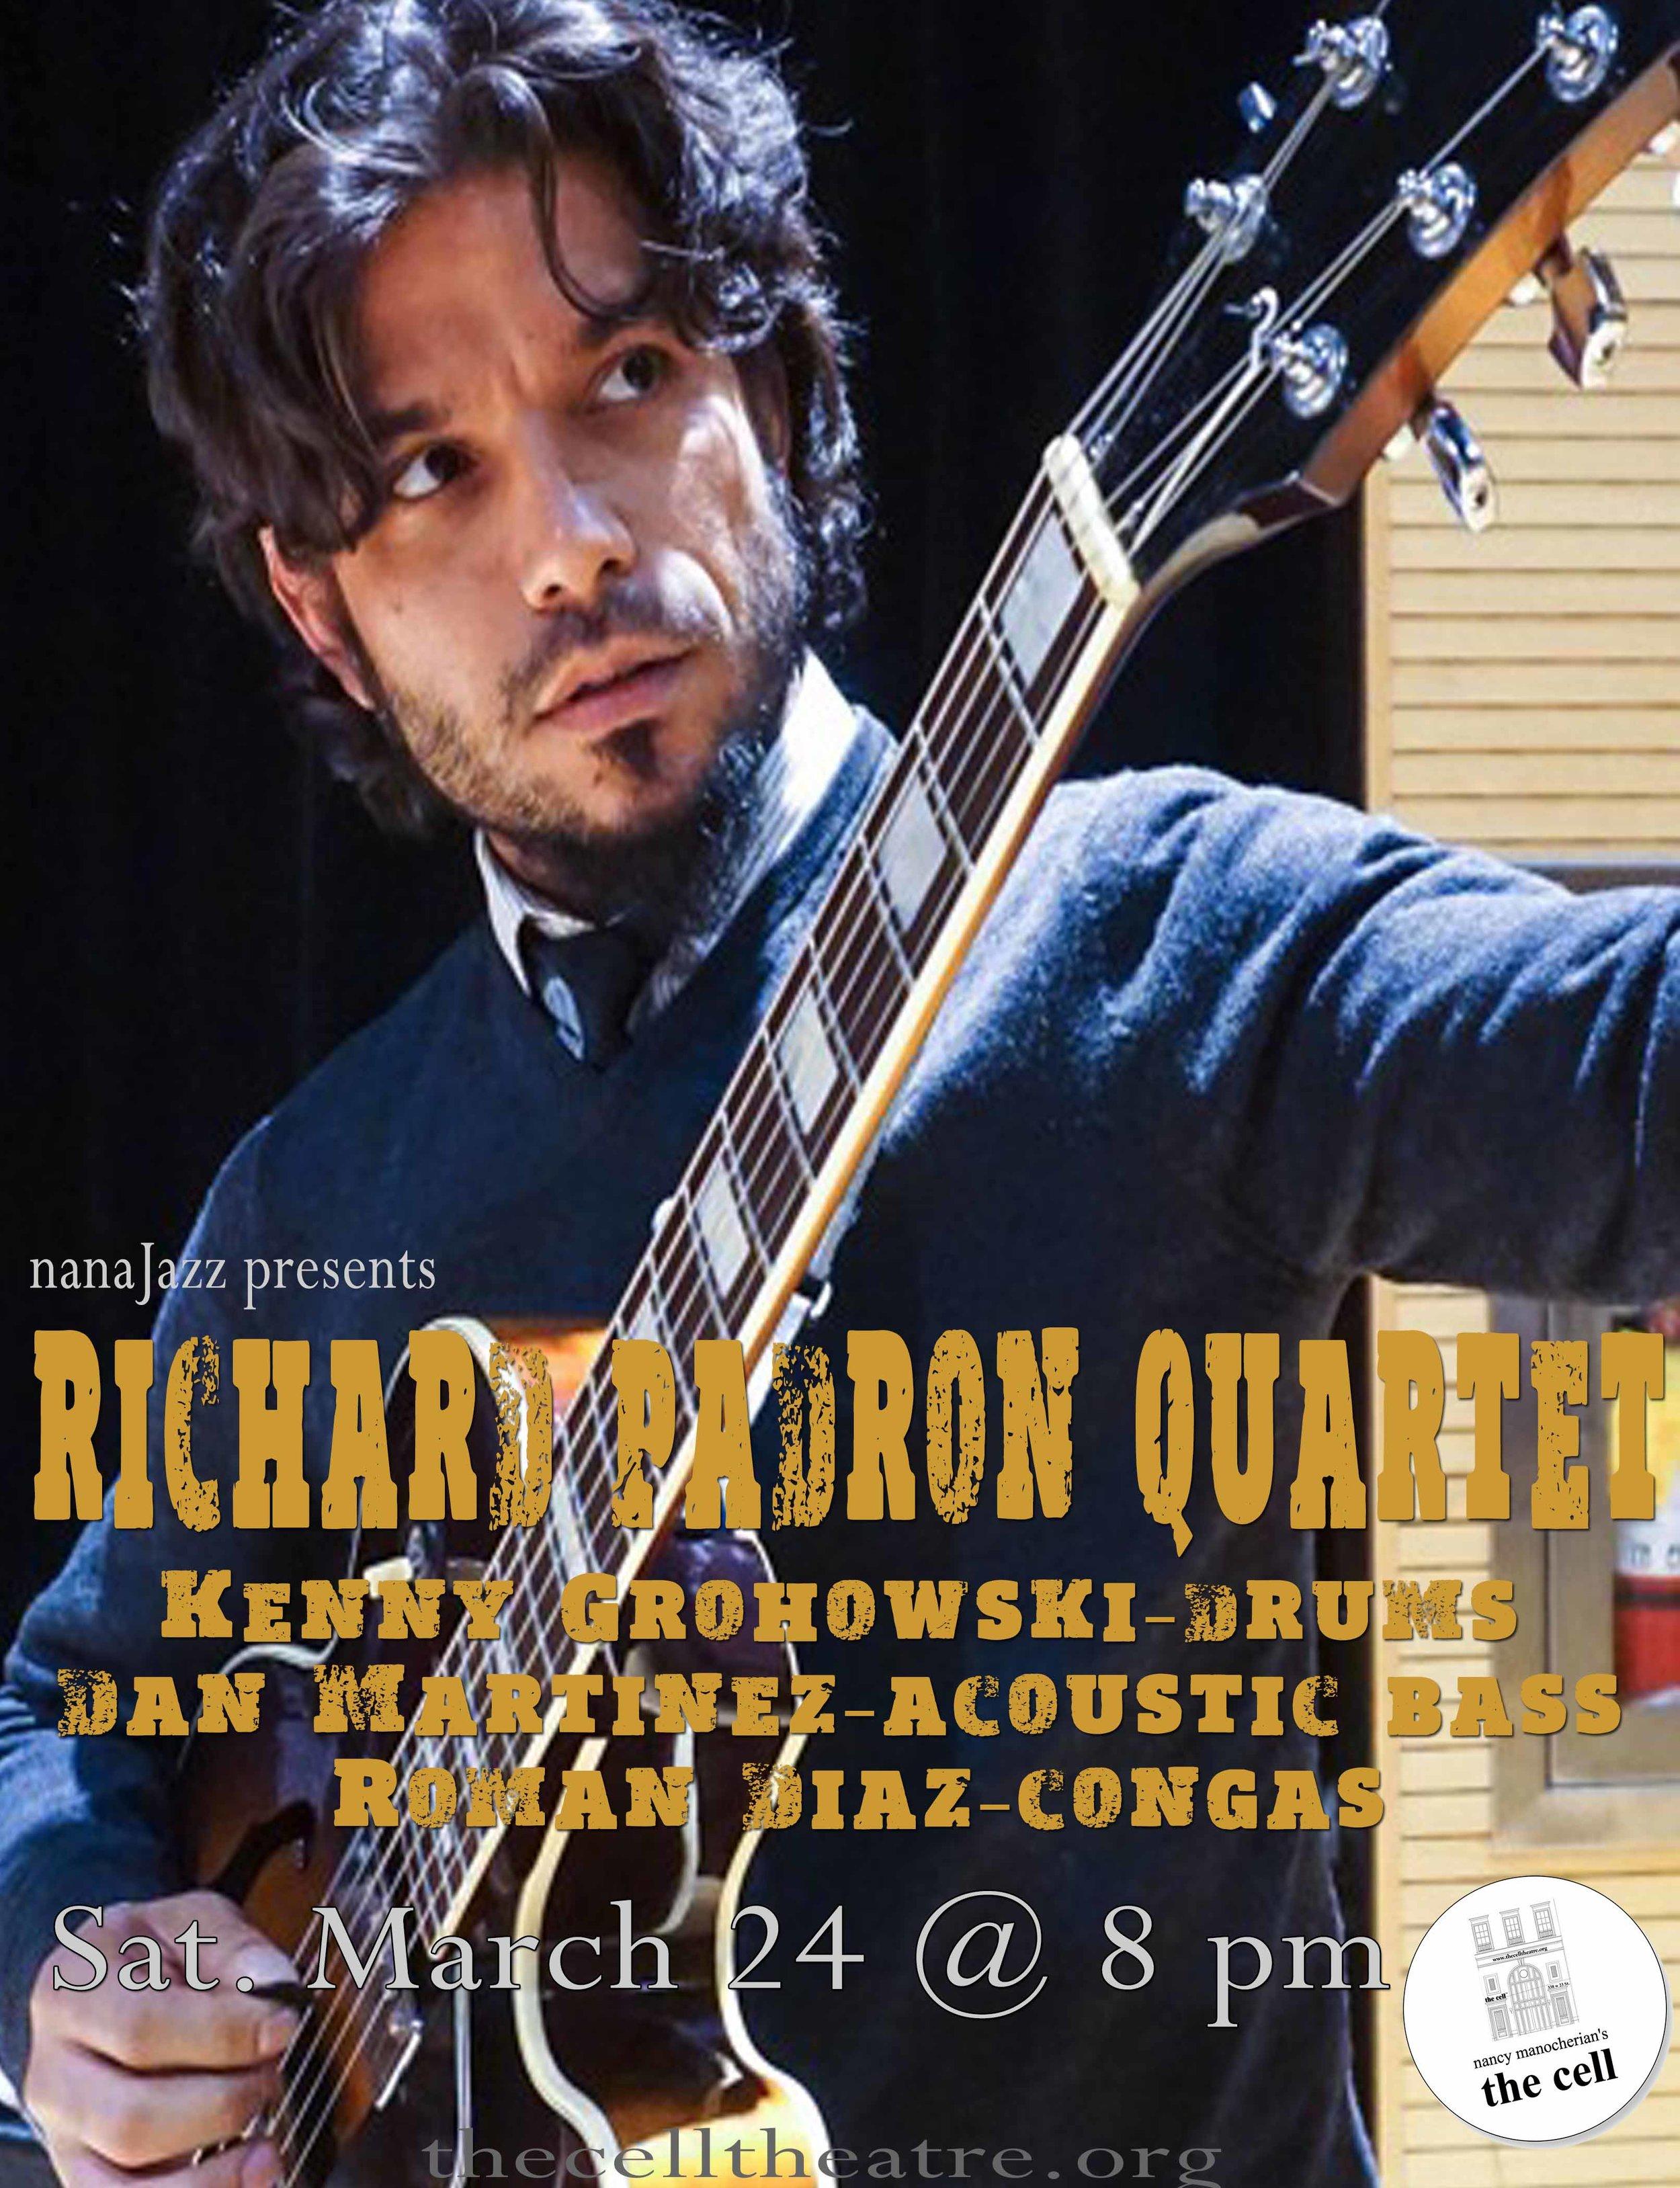 Richard Padron Quartet web.jpg